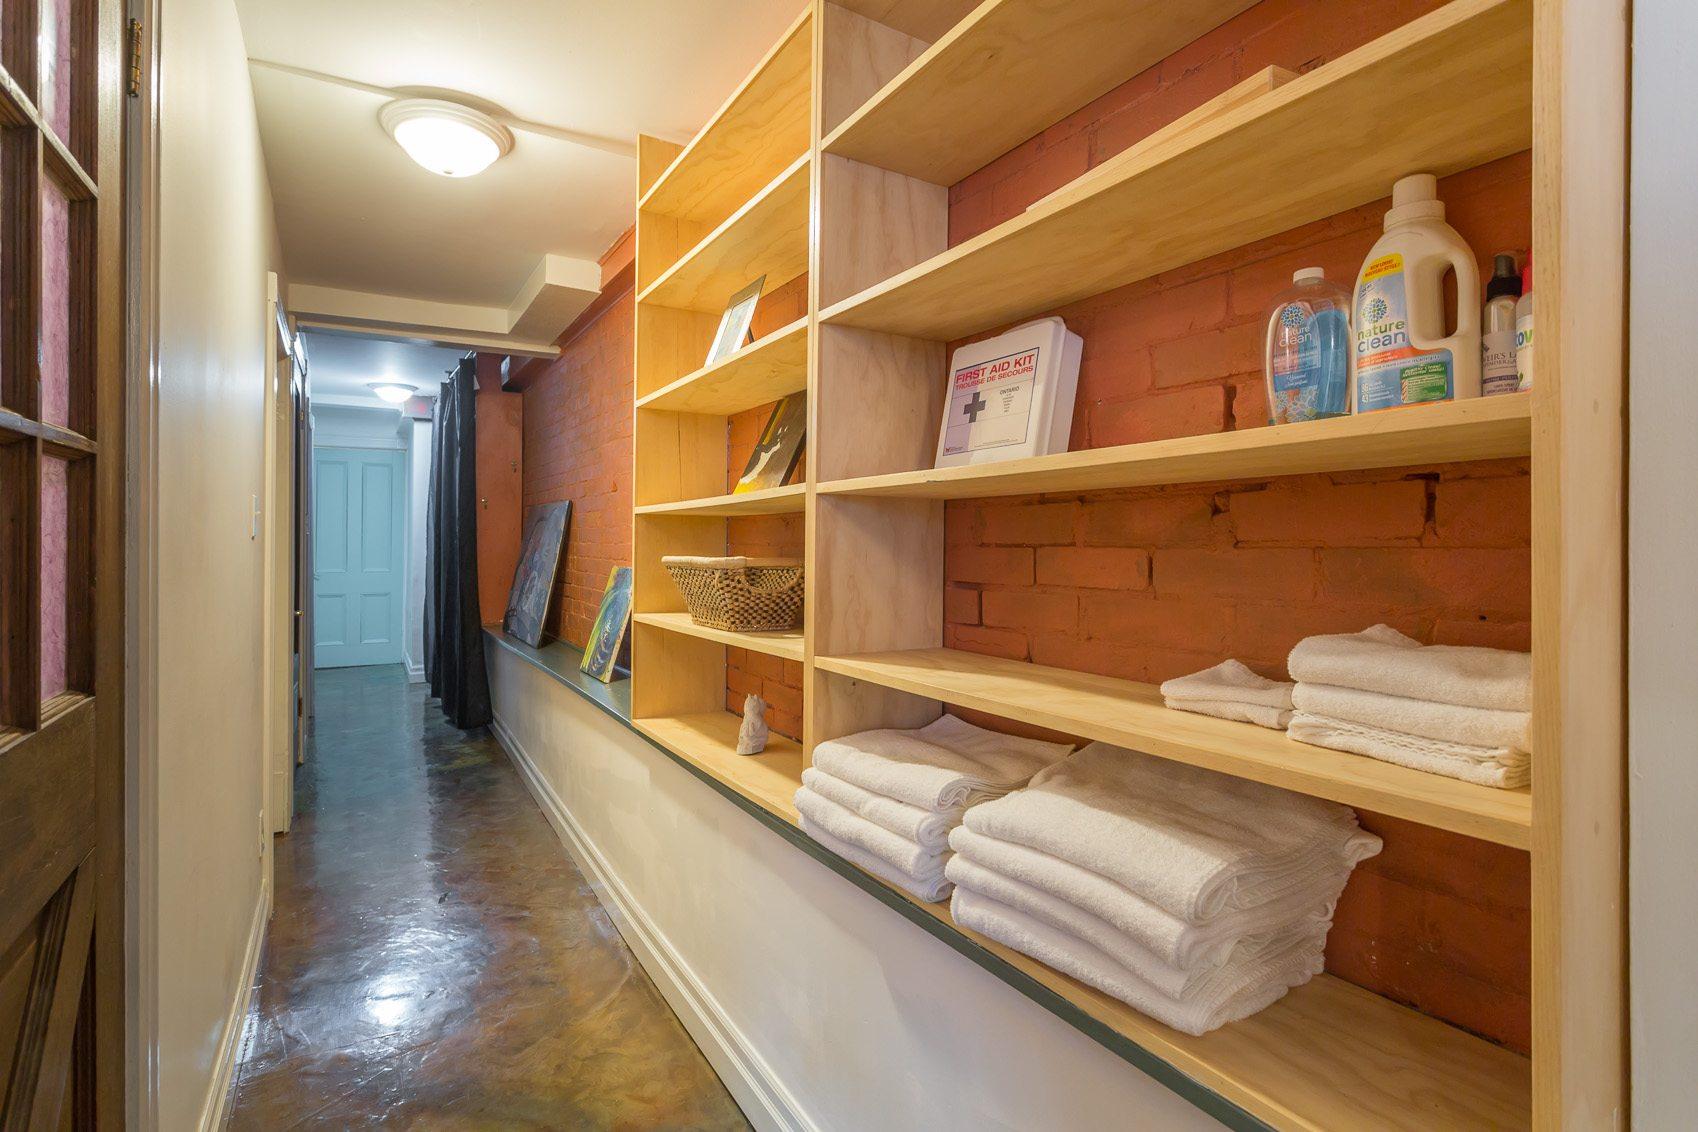 toronto-house-for-sale-44-nassau-street-13